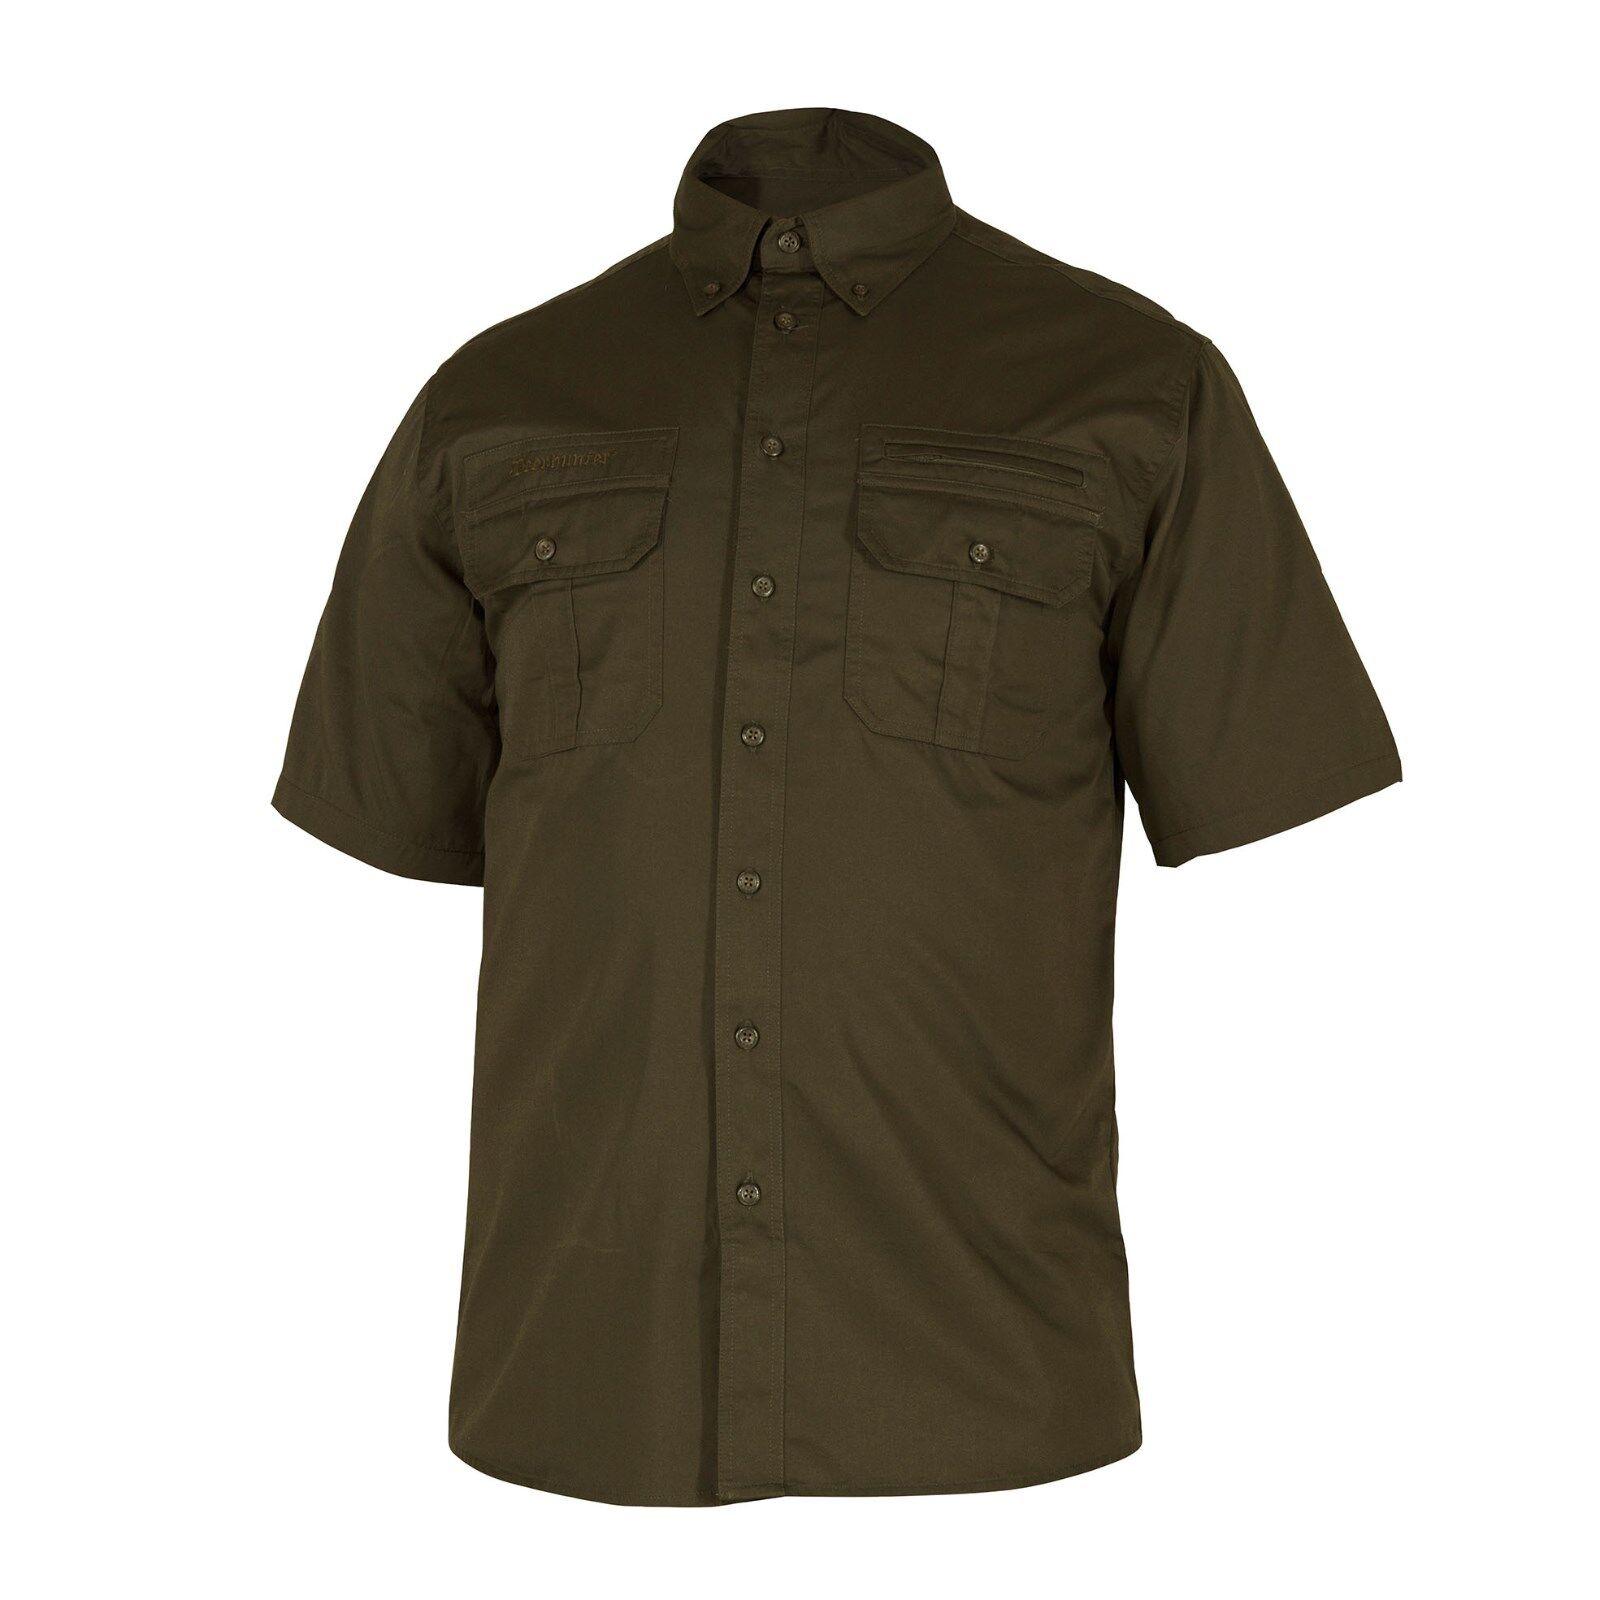 DEERHUNTER 8081 CARIBOU Jagdhemd, kurzärmliges Hemd in Grün Gr. 37/38-47/48